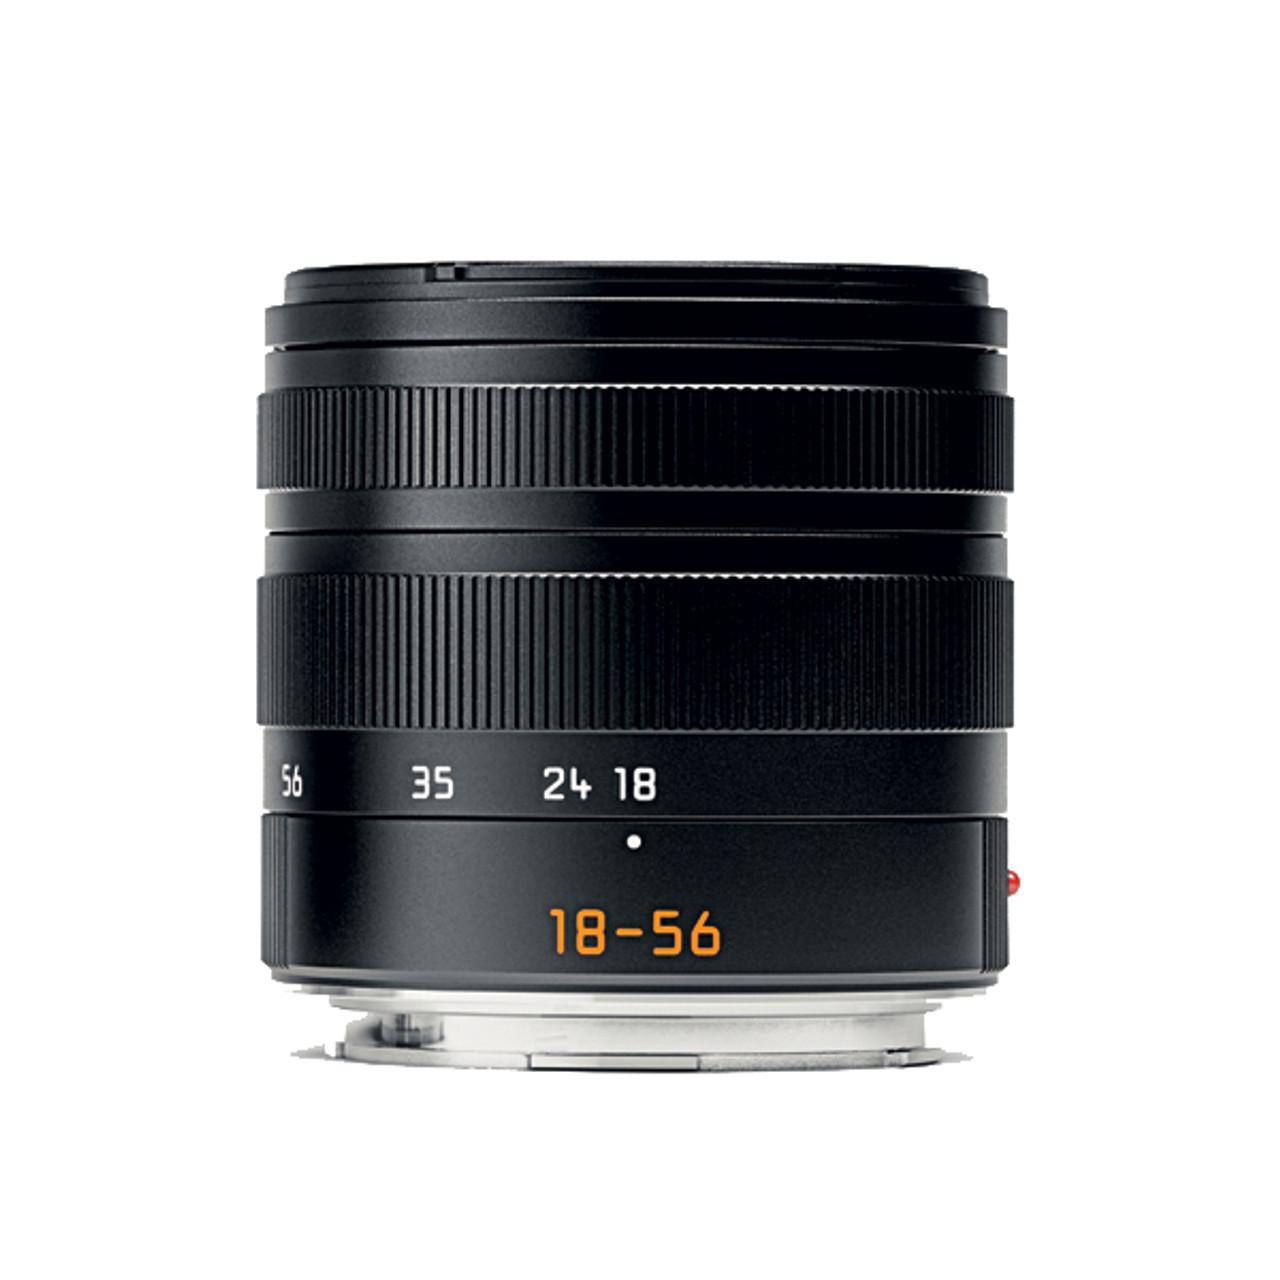 Leica Vario-Elmar-T 18-56mm F3.5-5.6 ASPH (11080)